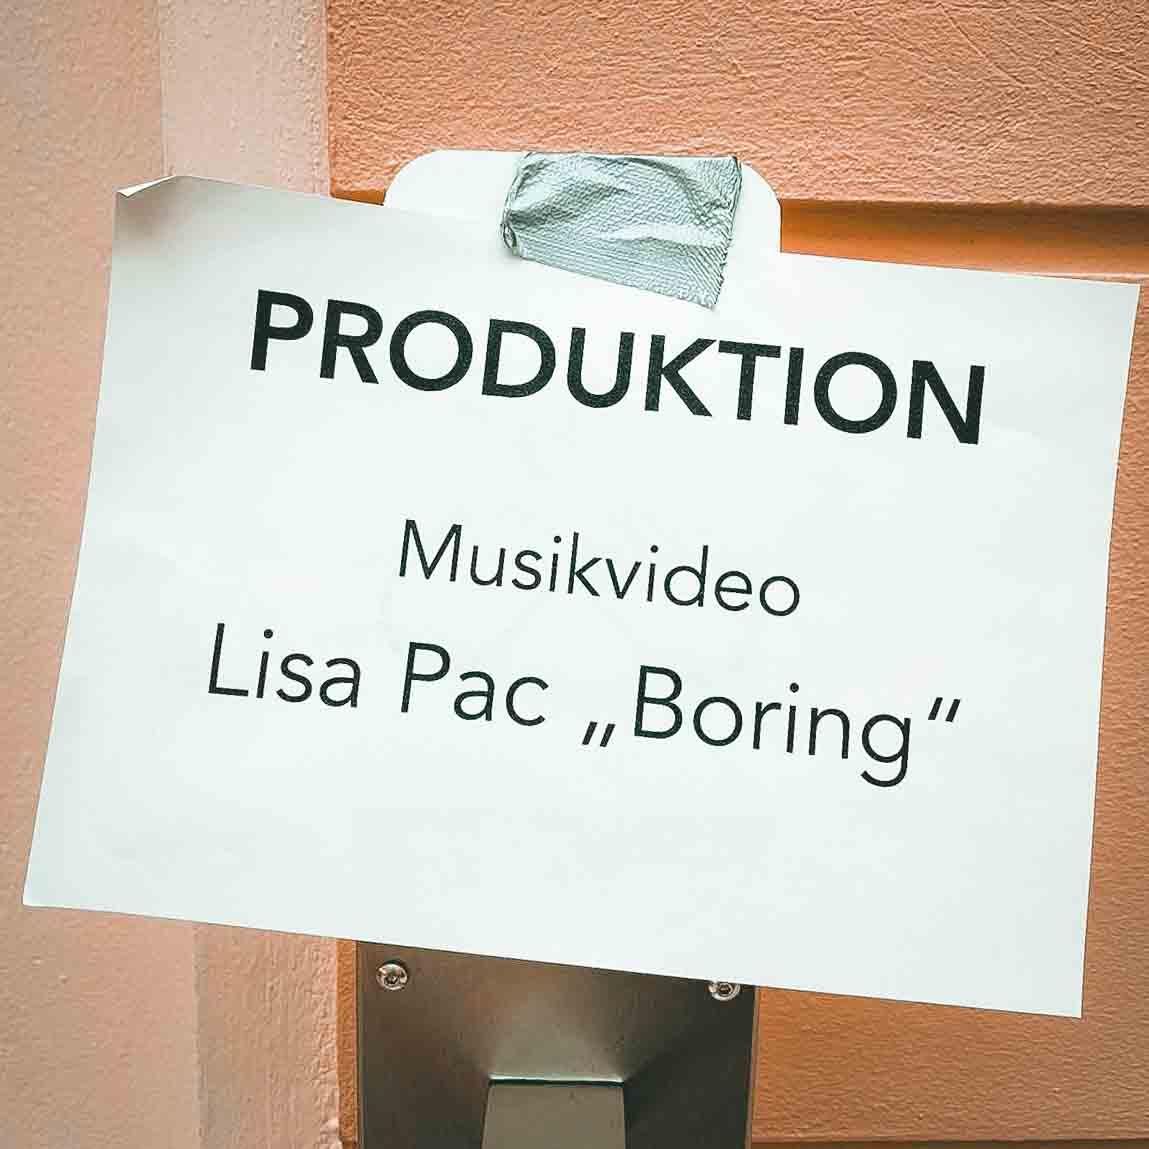 Lisa Pac - Boring BTS Pics Komprimiert (11 von 19)